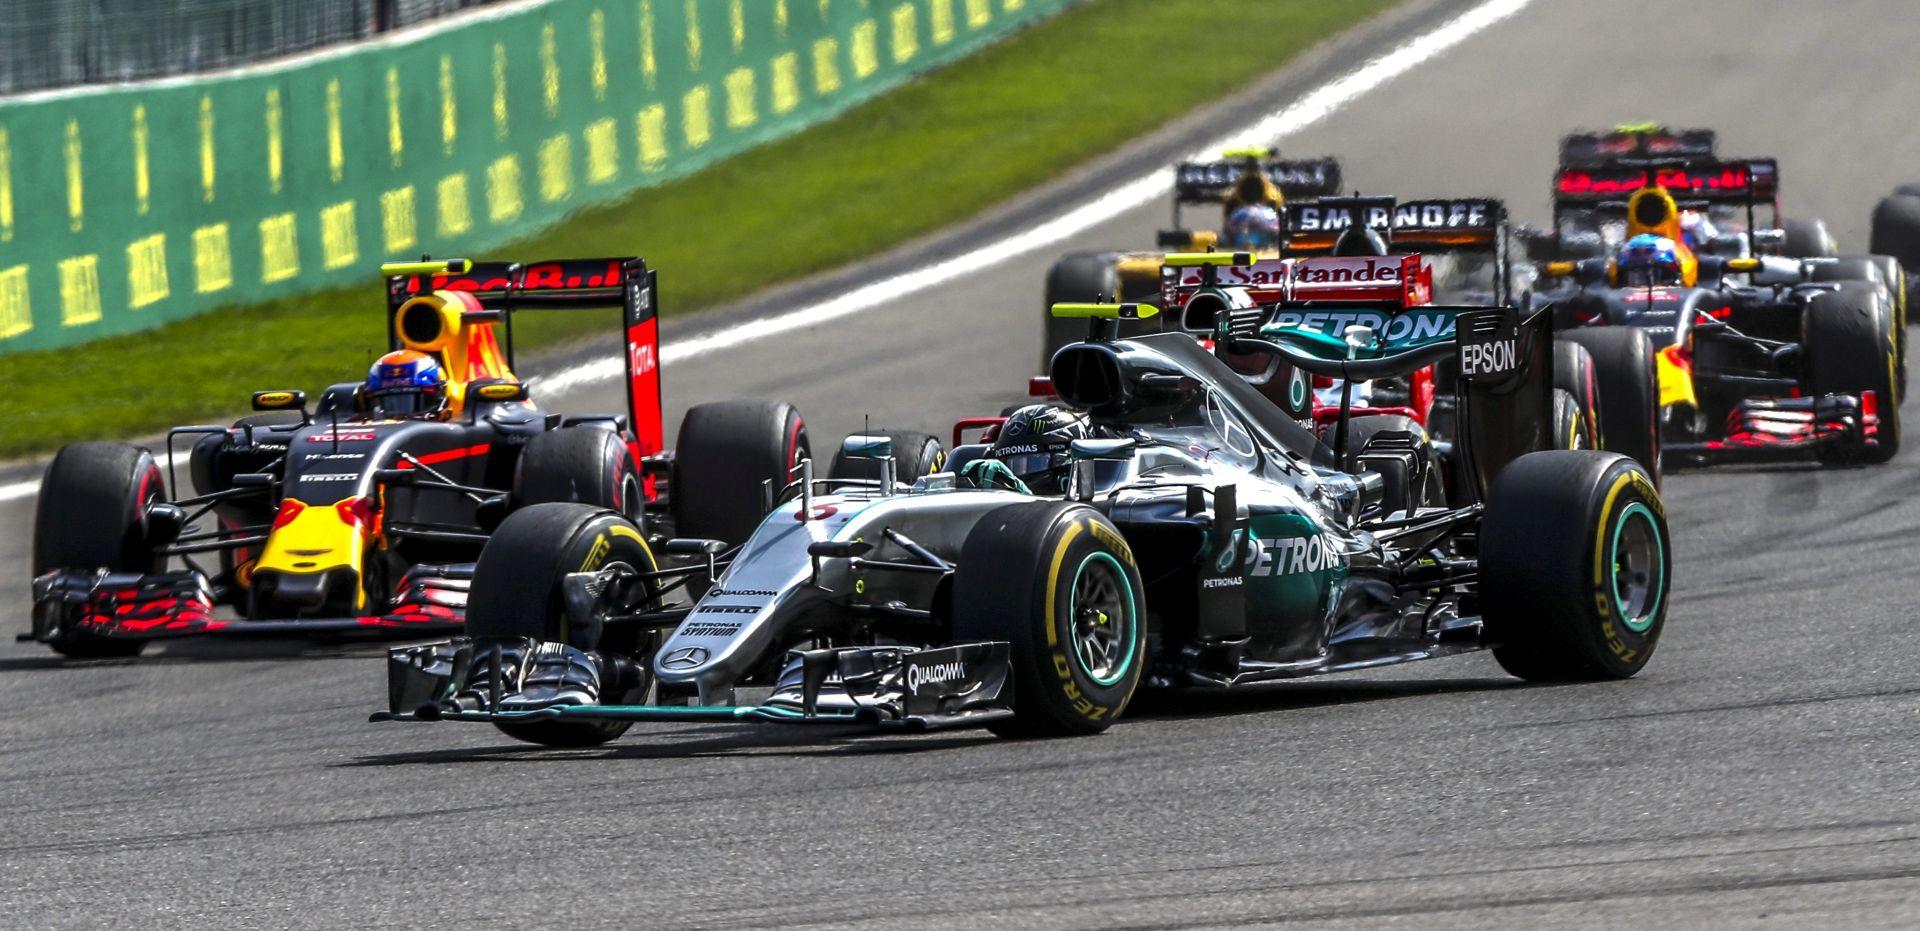 VN Brazila: Hamilton ispred Rosberga, odluka o prvaku u zadnjoj utrci